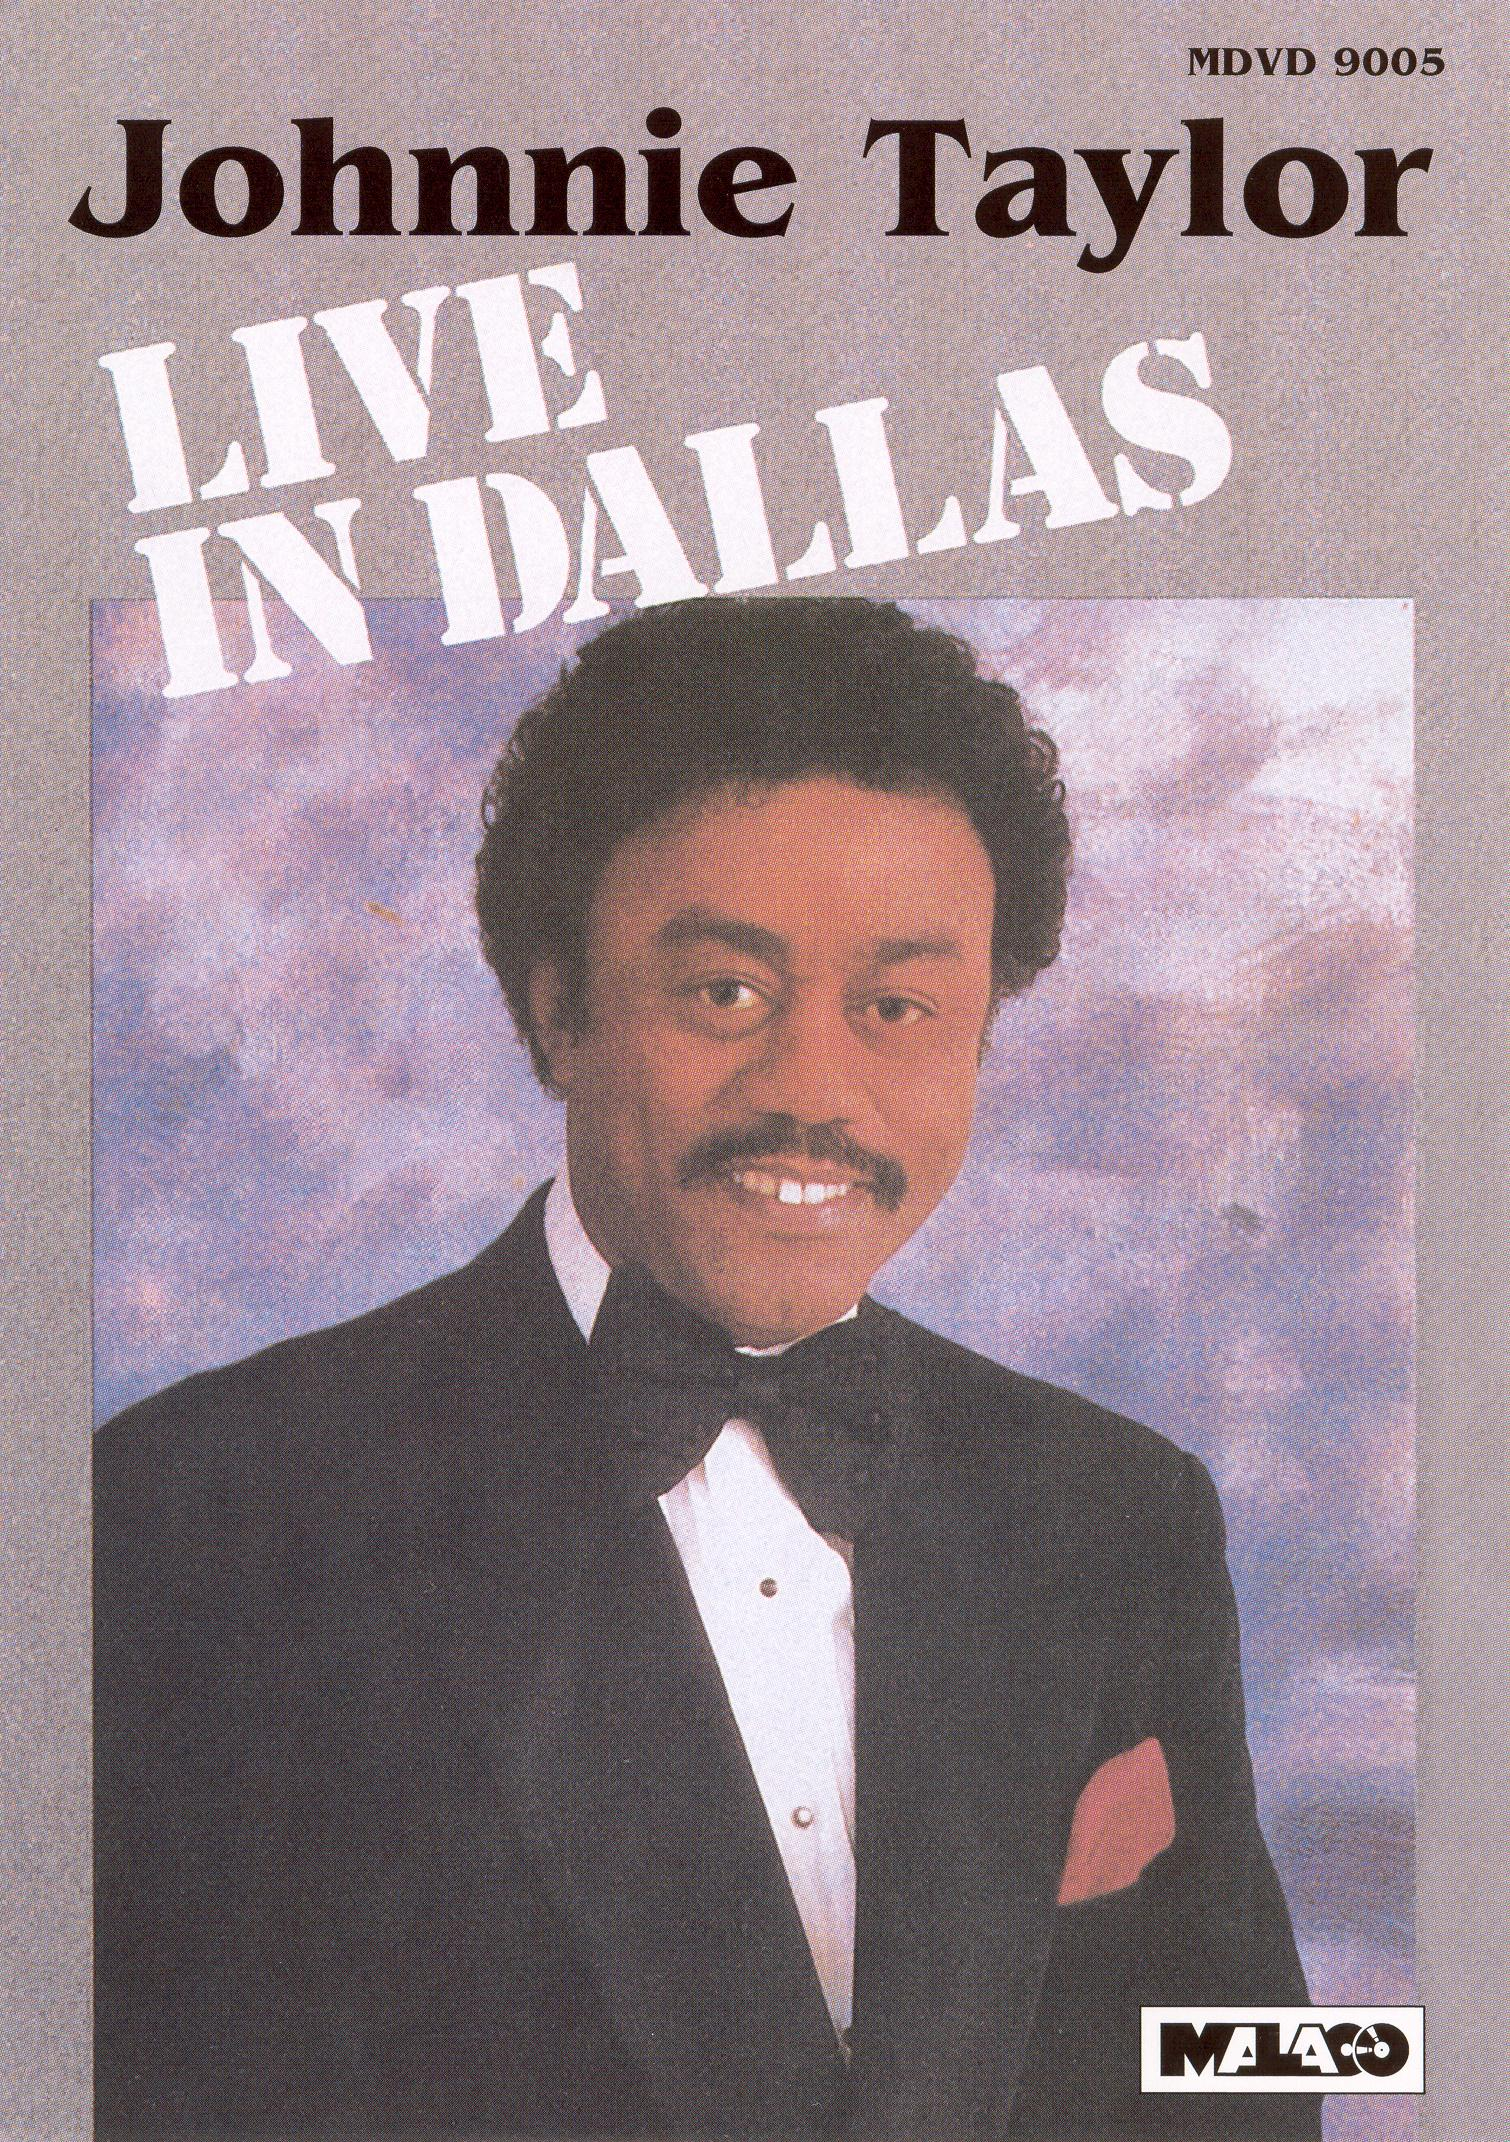 Johnnie Taylor: Live in Dallas